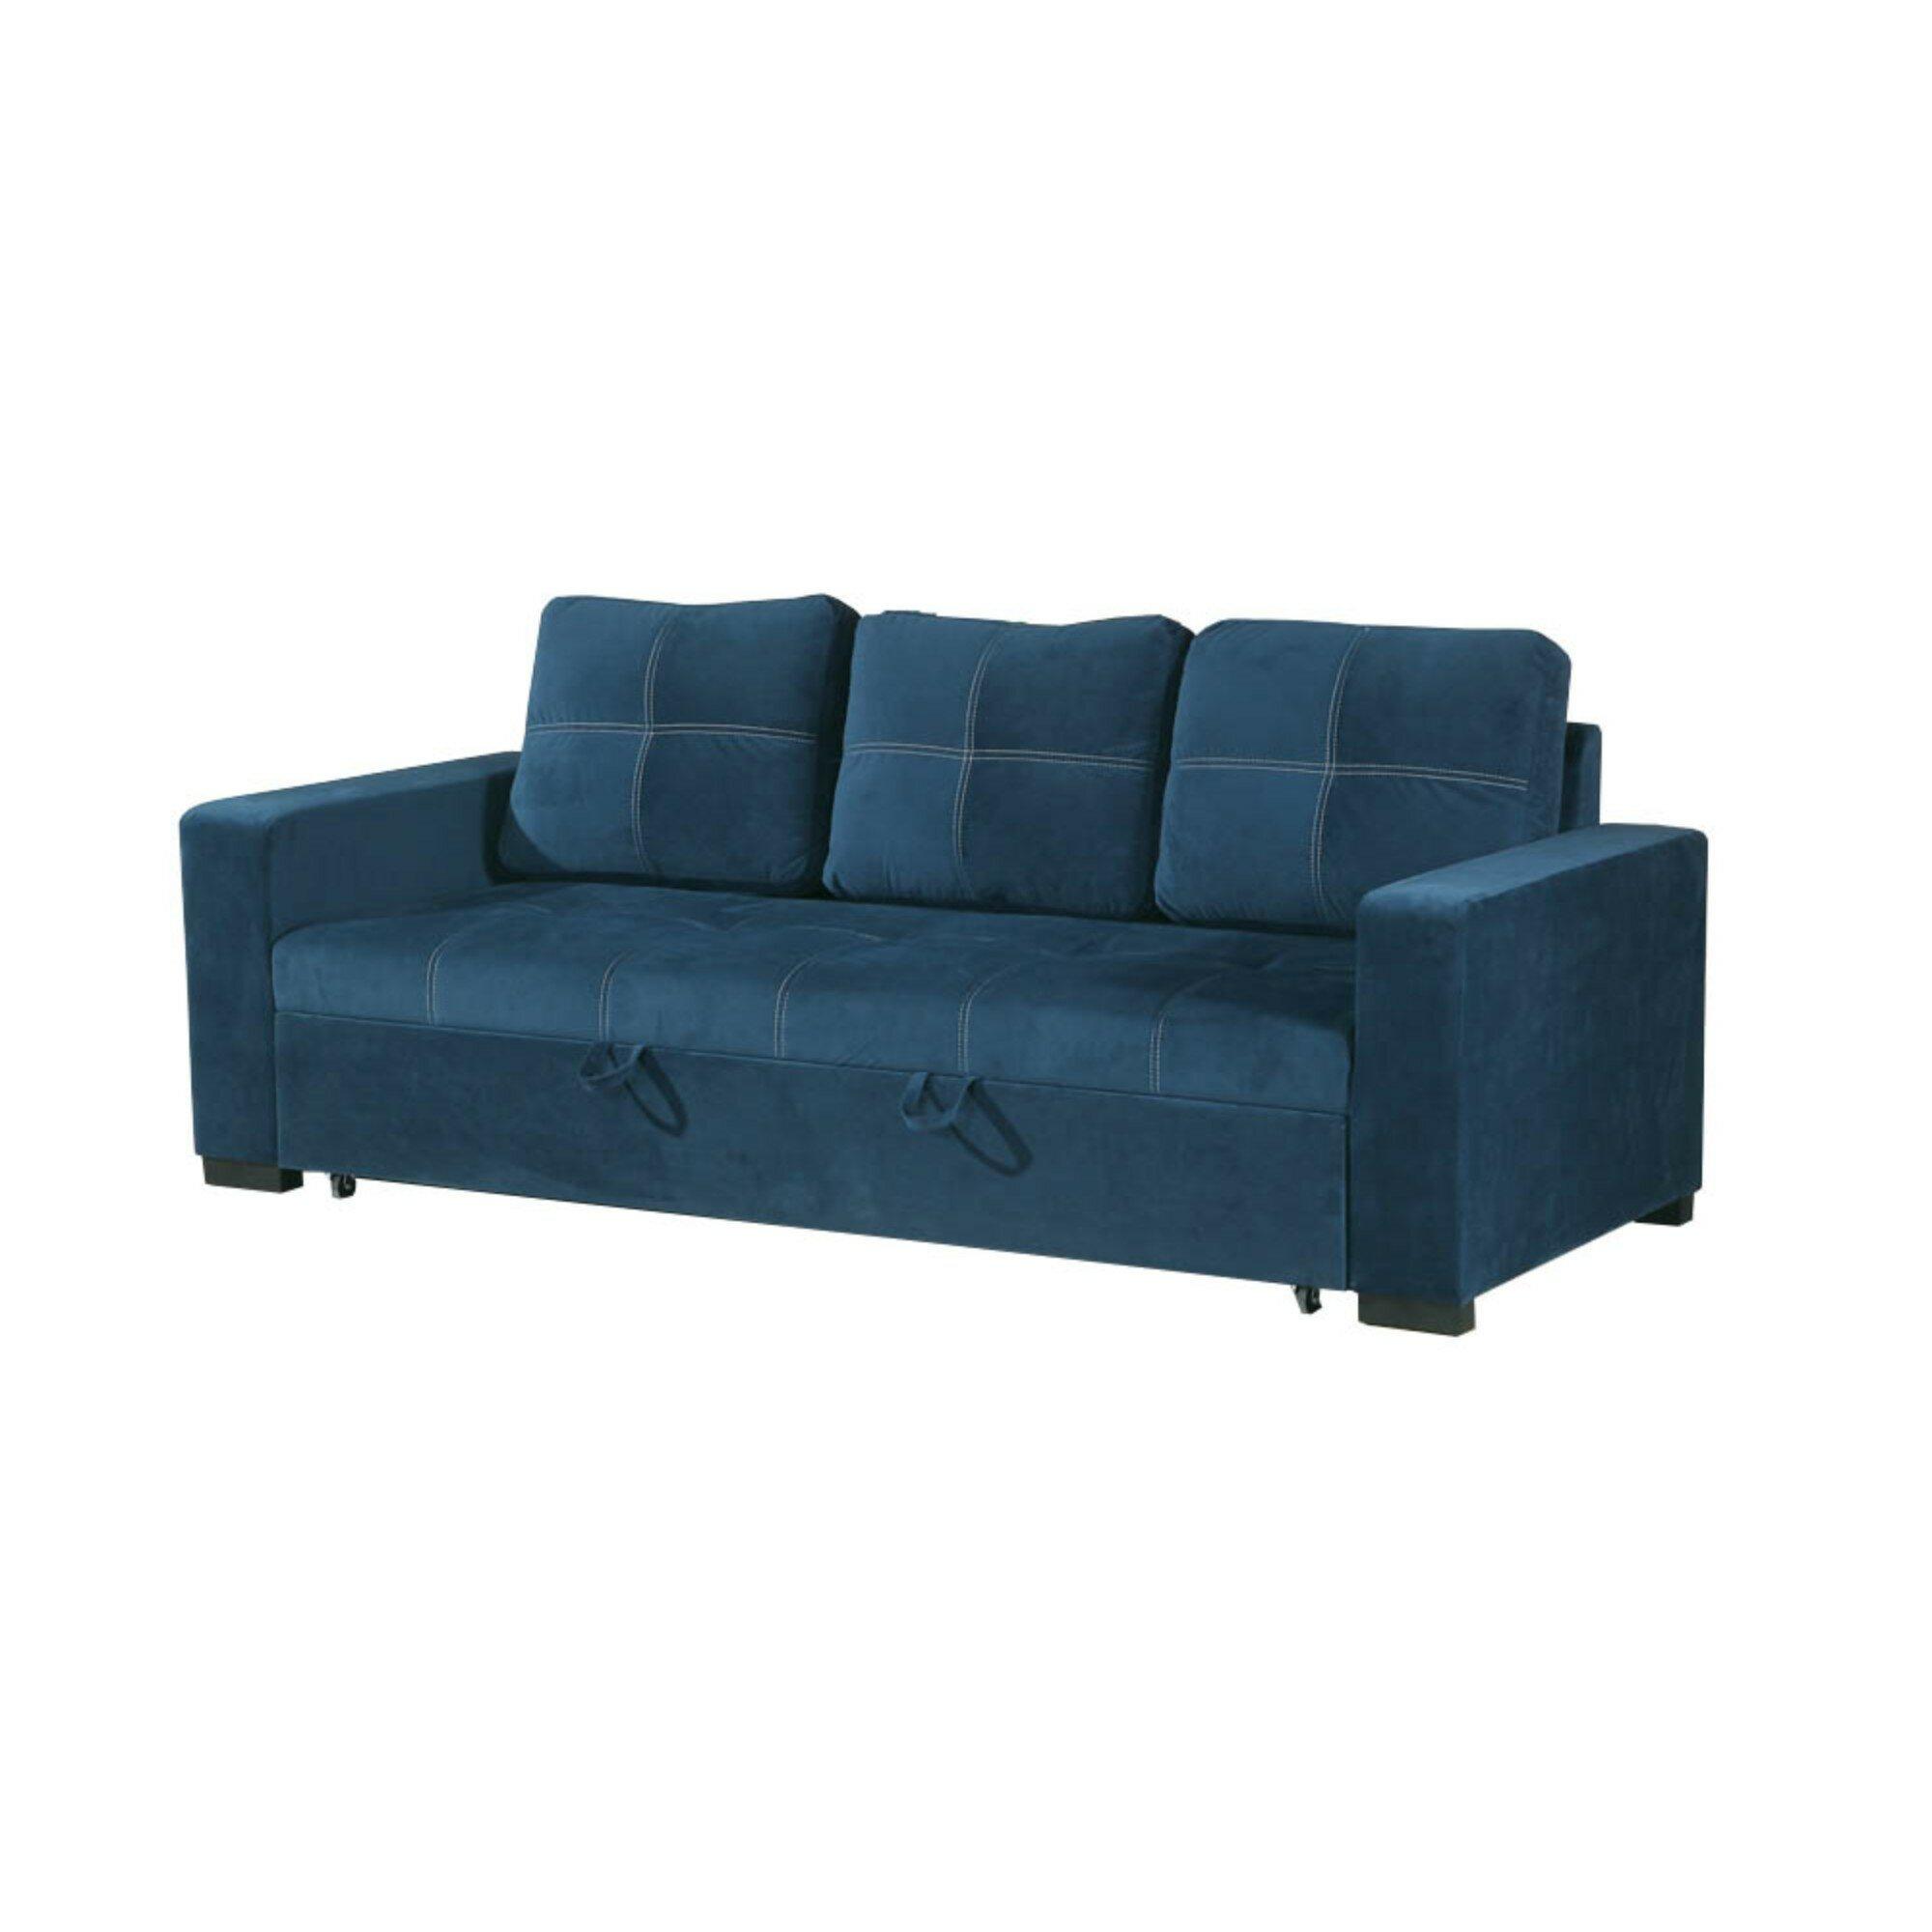 Lusher Polyfiber Fabric Sofa